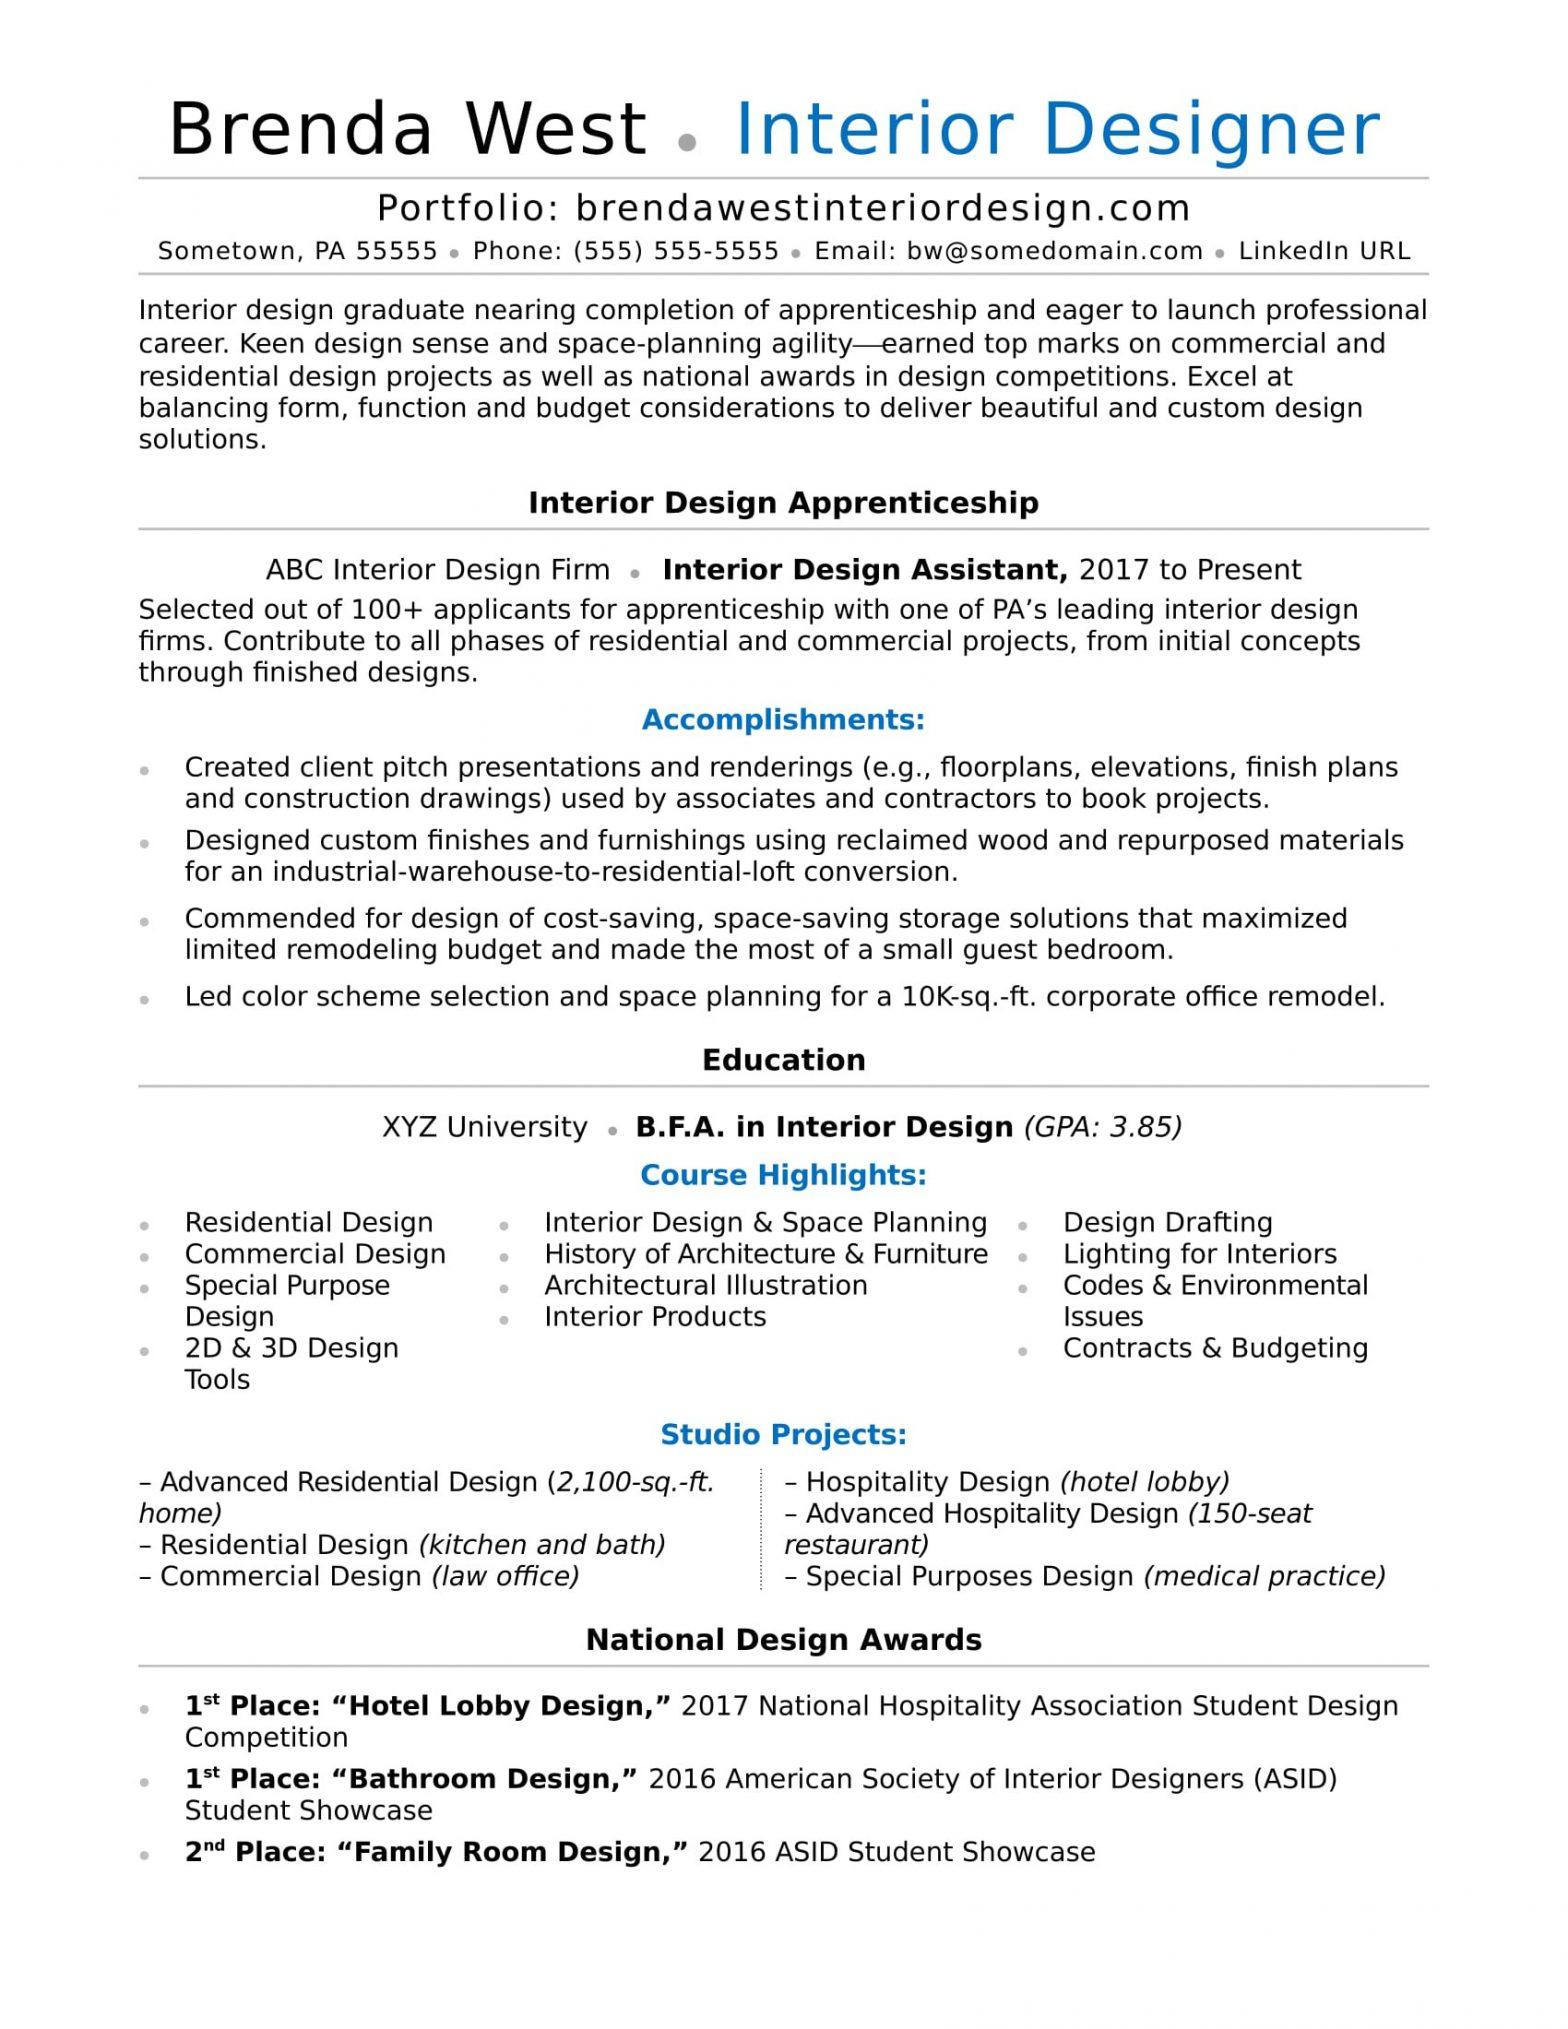 Sample Resume for Interior Design Internship Interior Design Resume Sample Monster.com